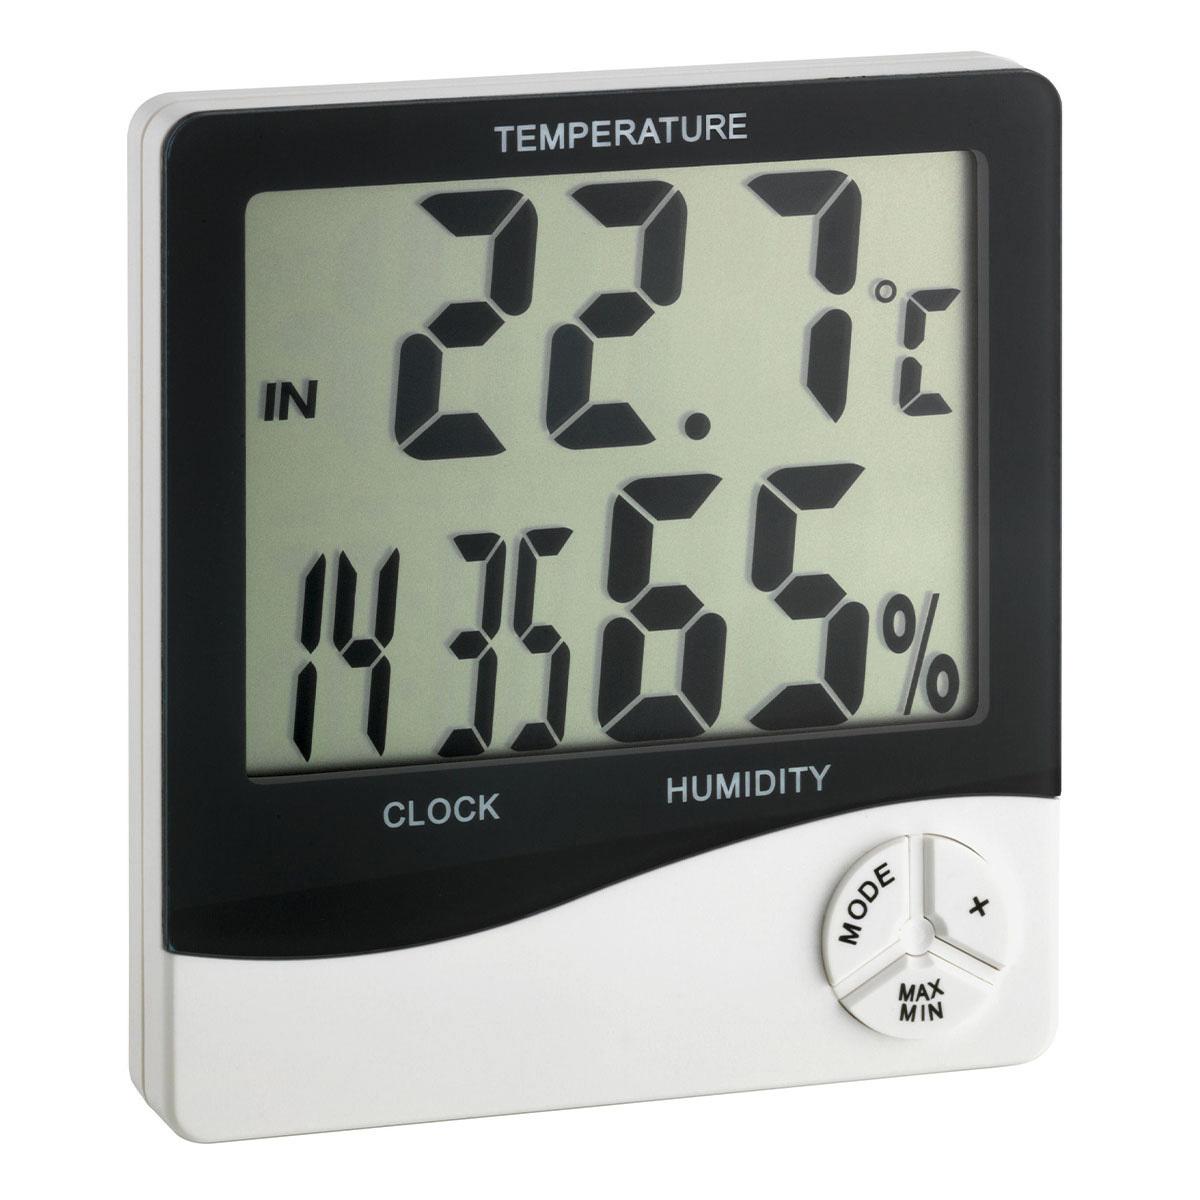 30-5031-digitales-thermo-hygrometer-1200x1200px.jpg